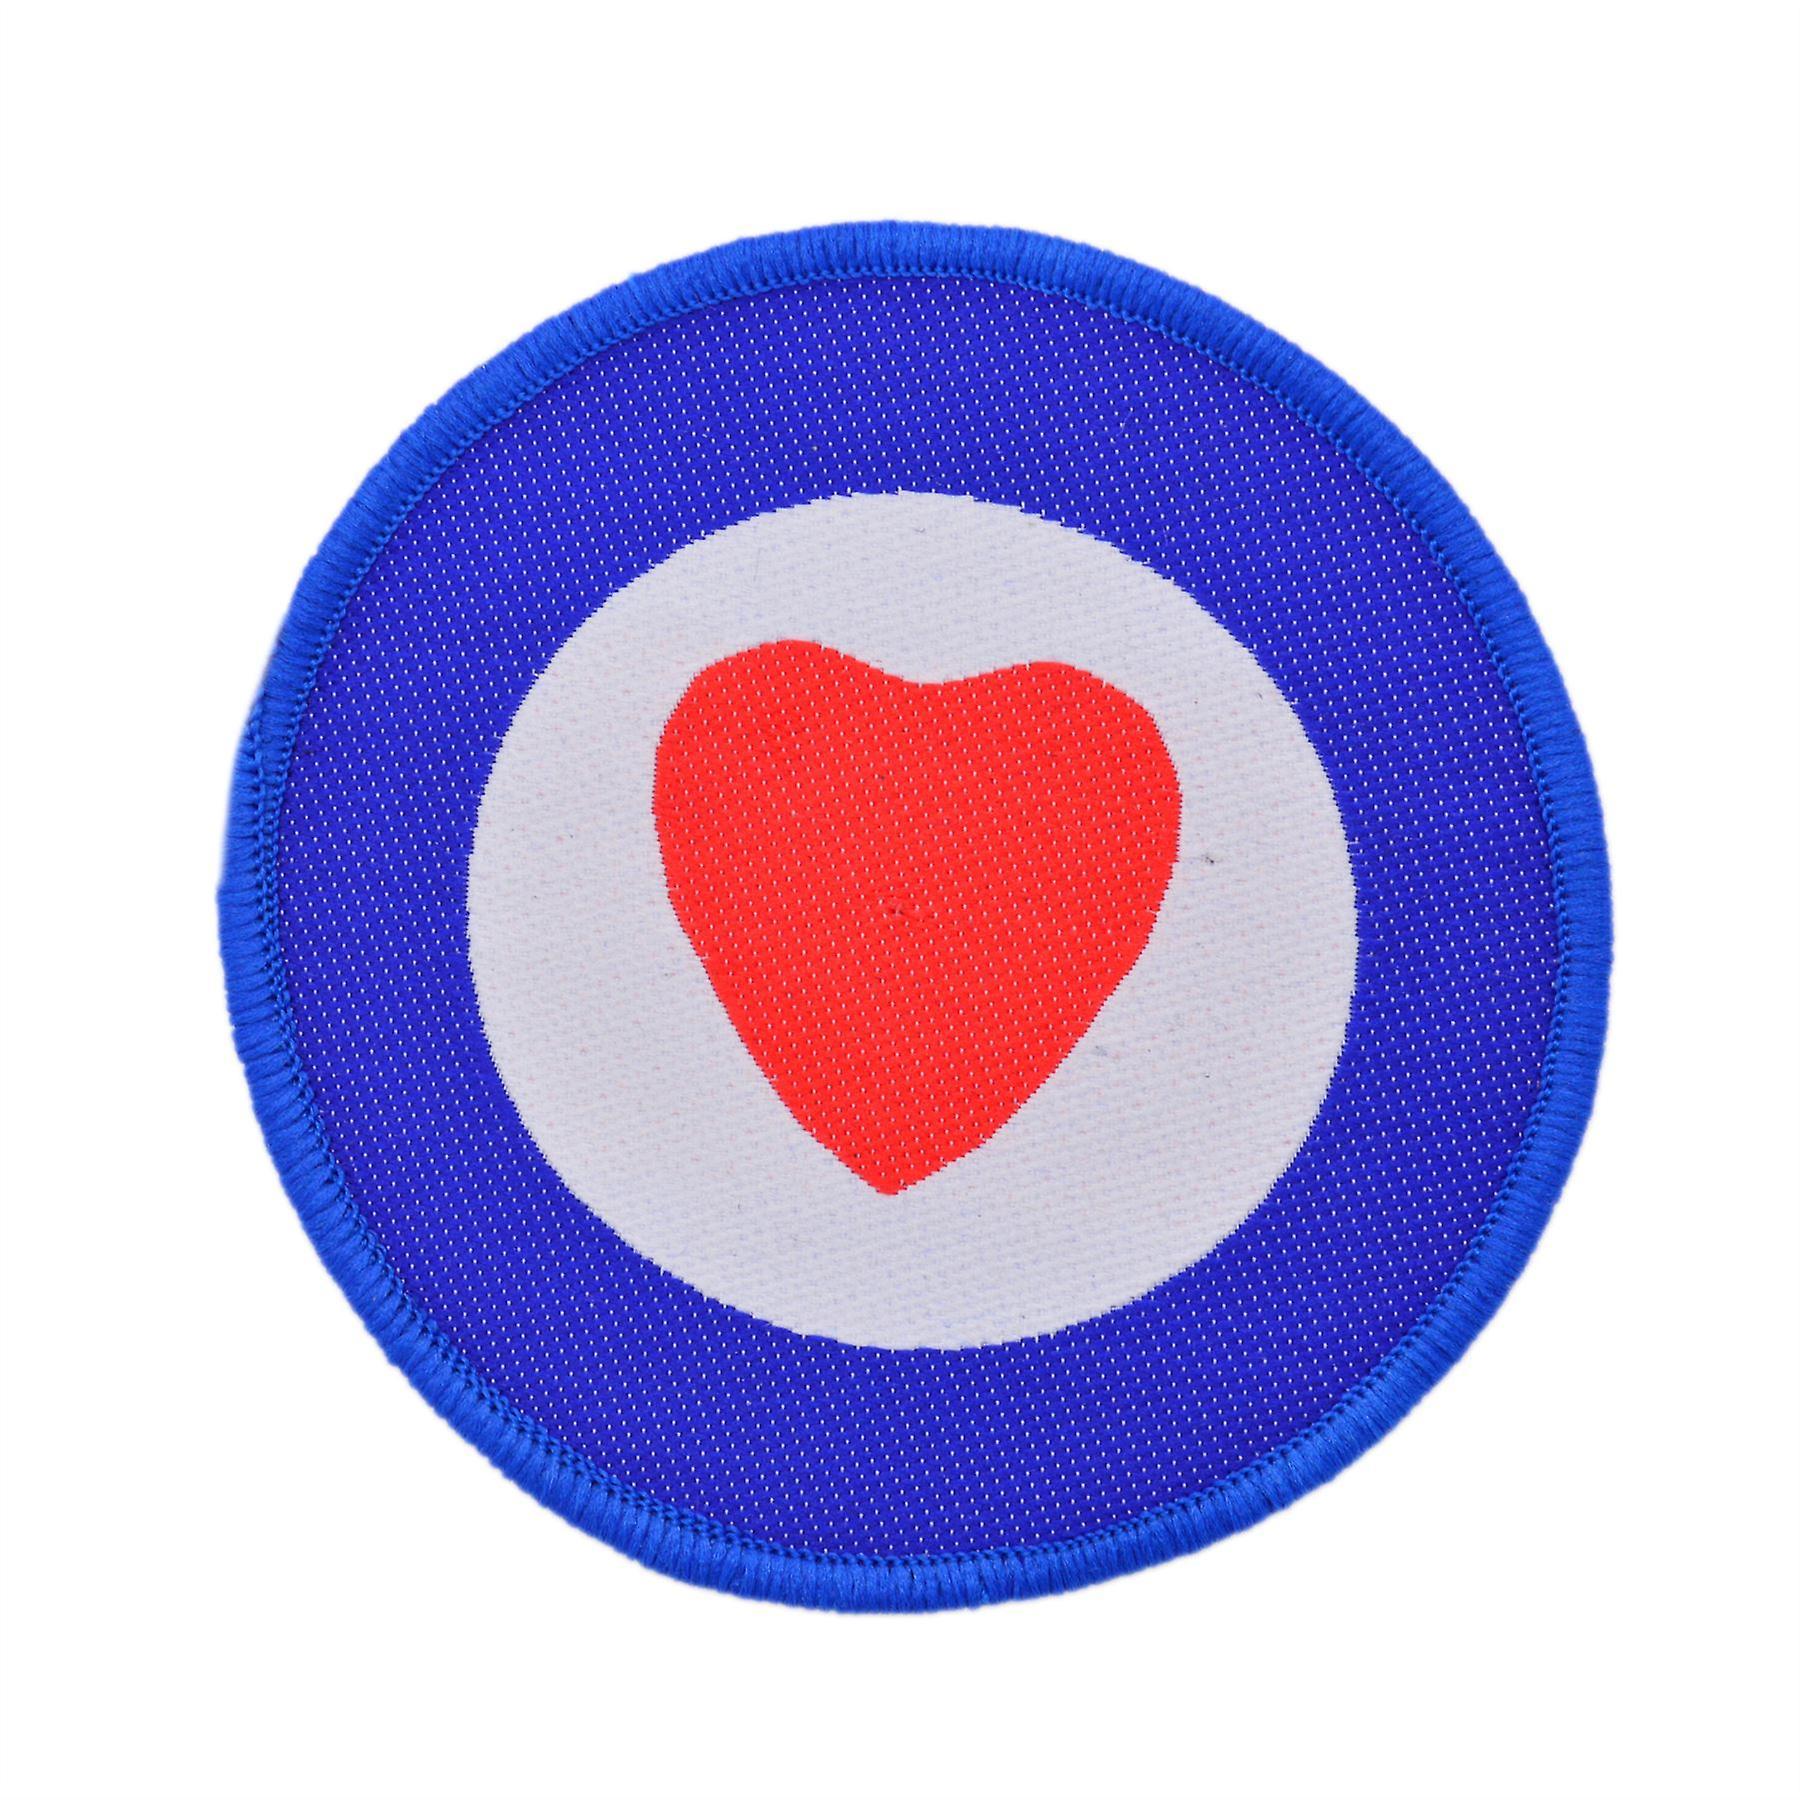 Heart Target Woven Patch